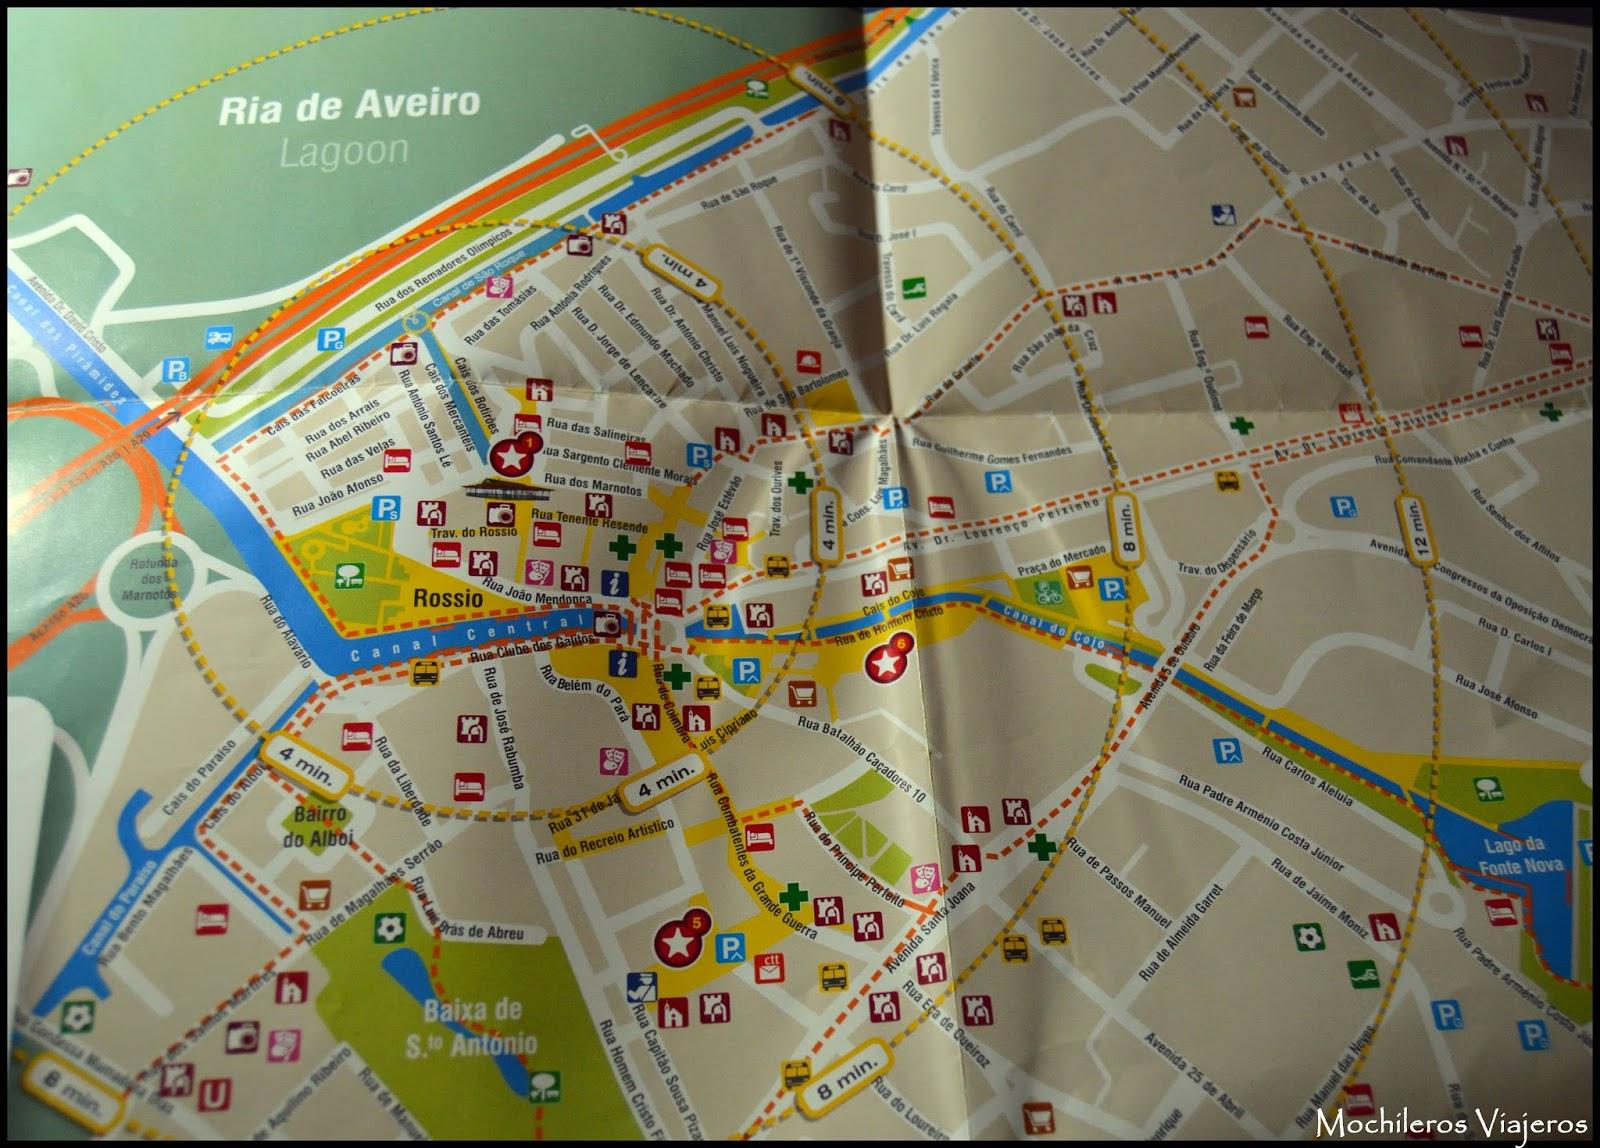 mapa turistico aveiro Aveiro, la Venecia portuguesa | Mochileros Viajeros mapa turistico aveiro